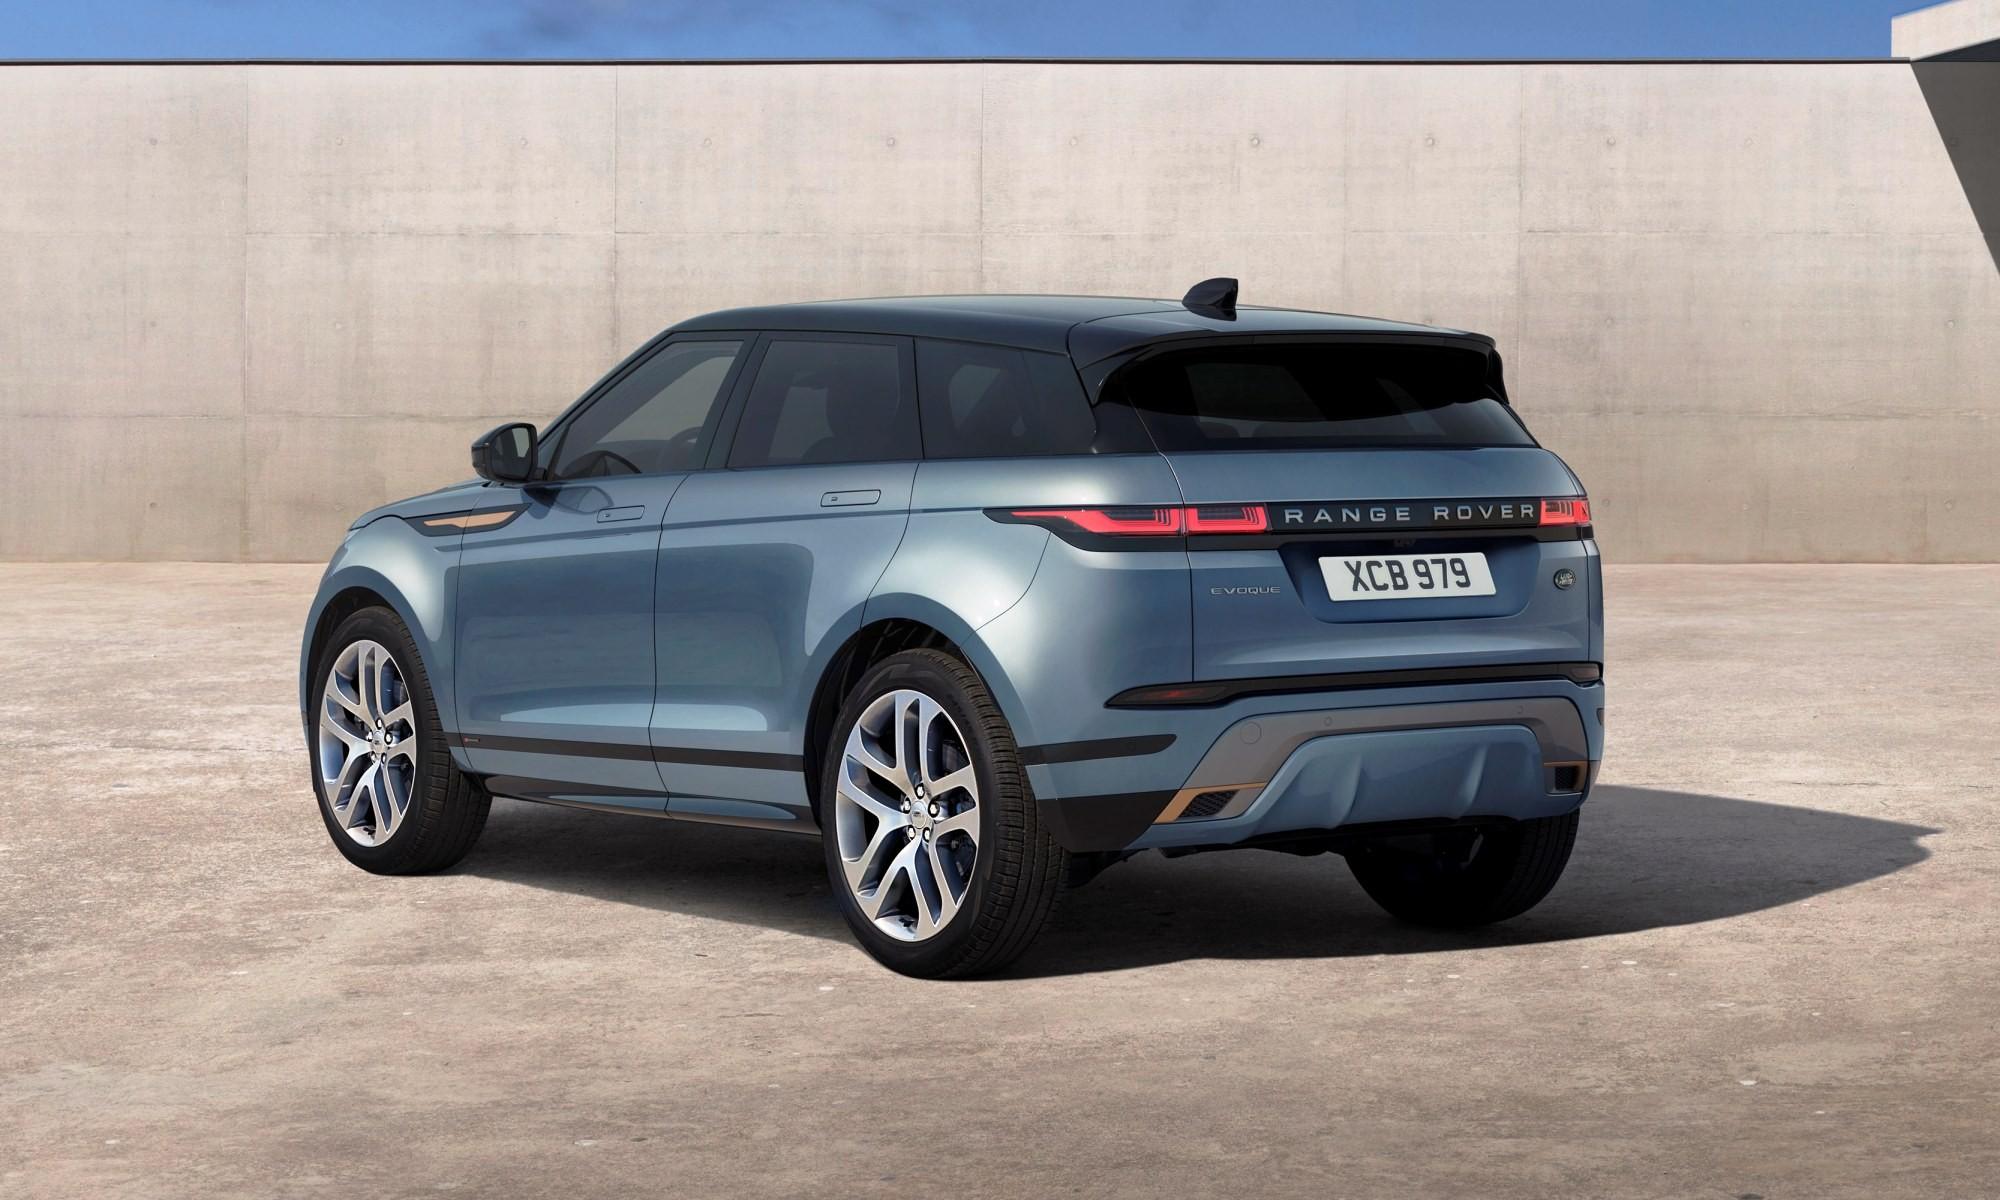 New Range Rover Evoque rear